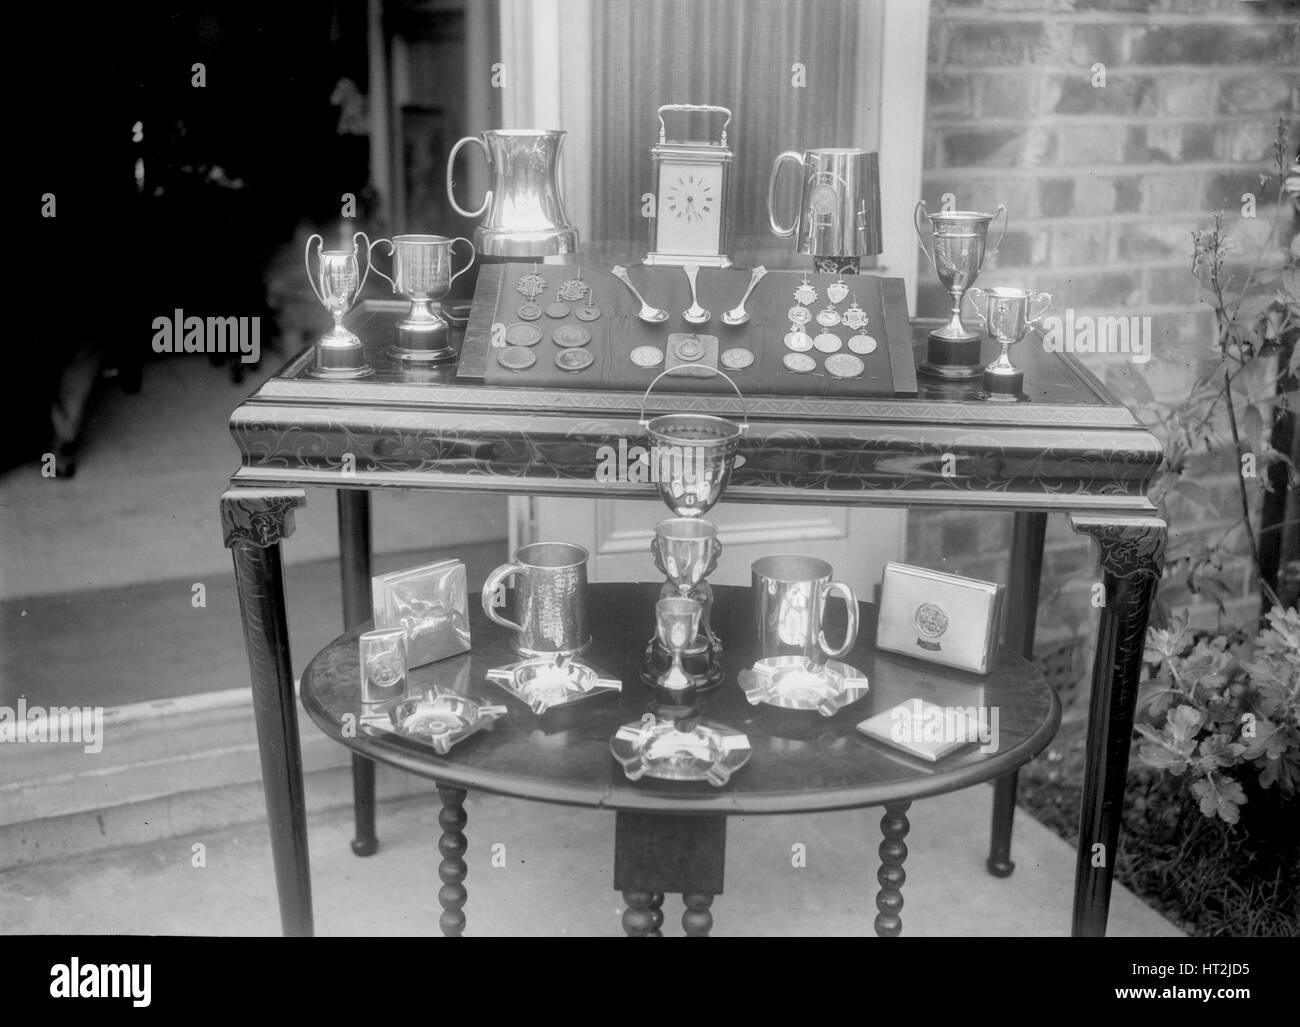 Motor sport trophies. Artist: Bill Brunell. - Stock Image